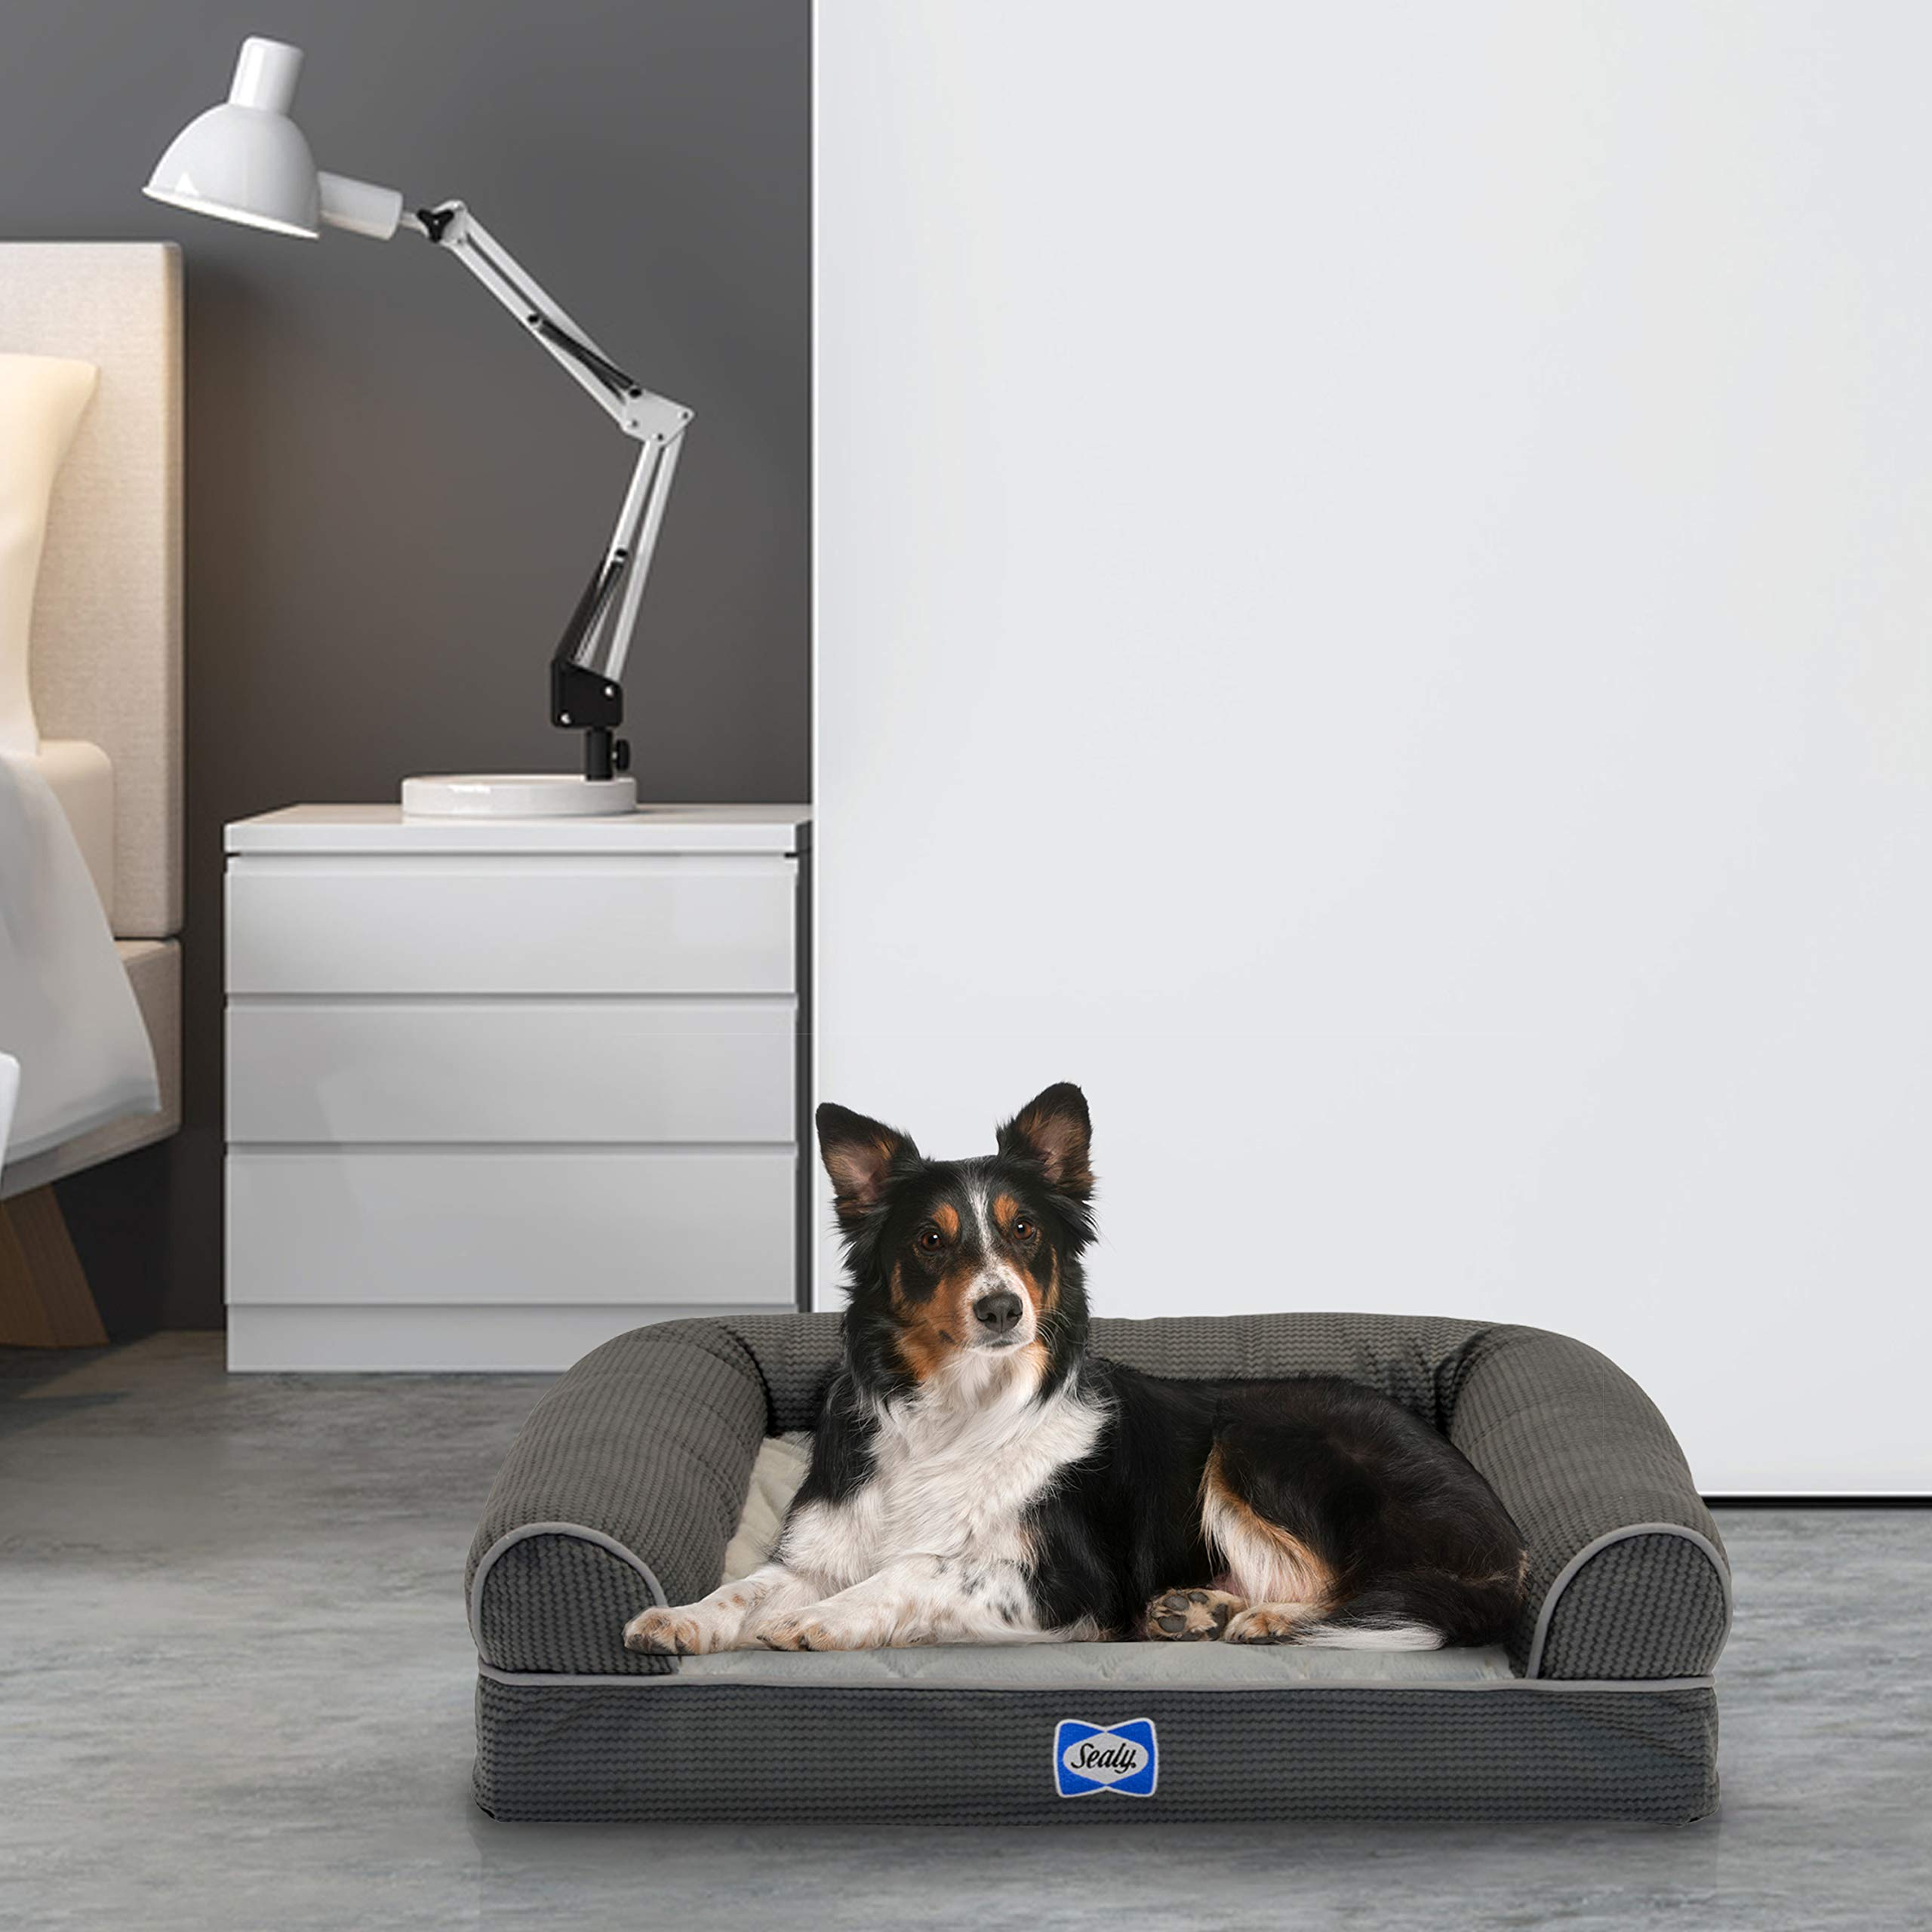 Sealy Ultra Plush Sofa-Style Bolster Dog Bed Gray, Medium - Orthopedic Foam Pet Bed with Machine Washable Plush Cover